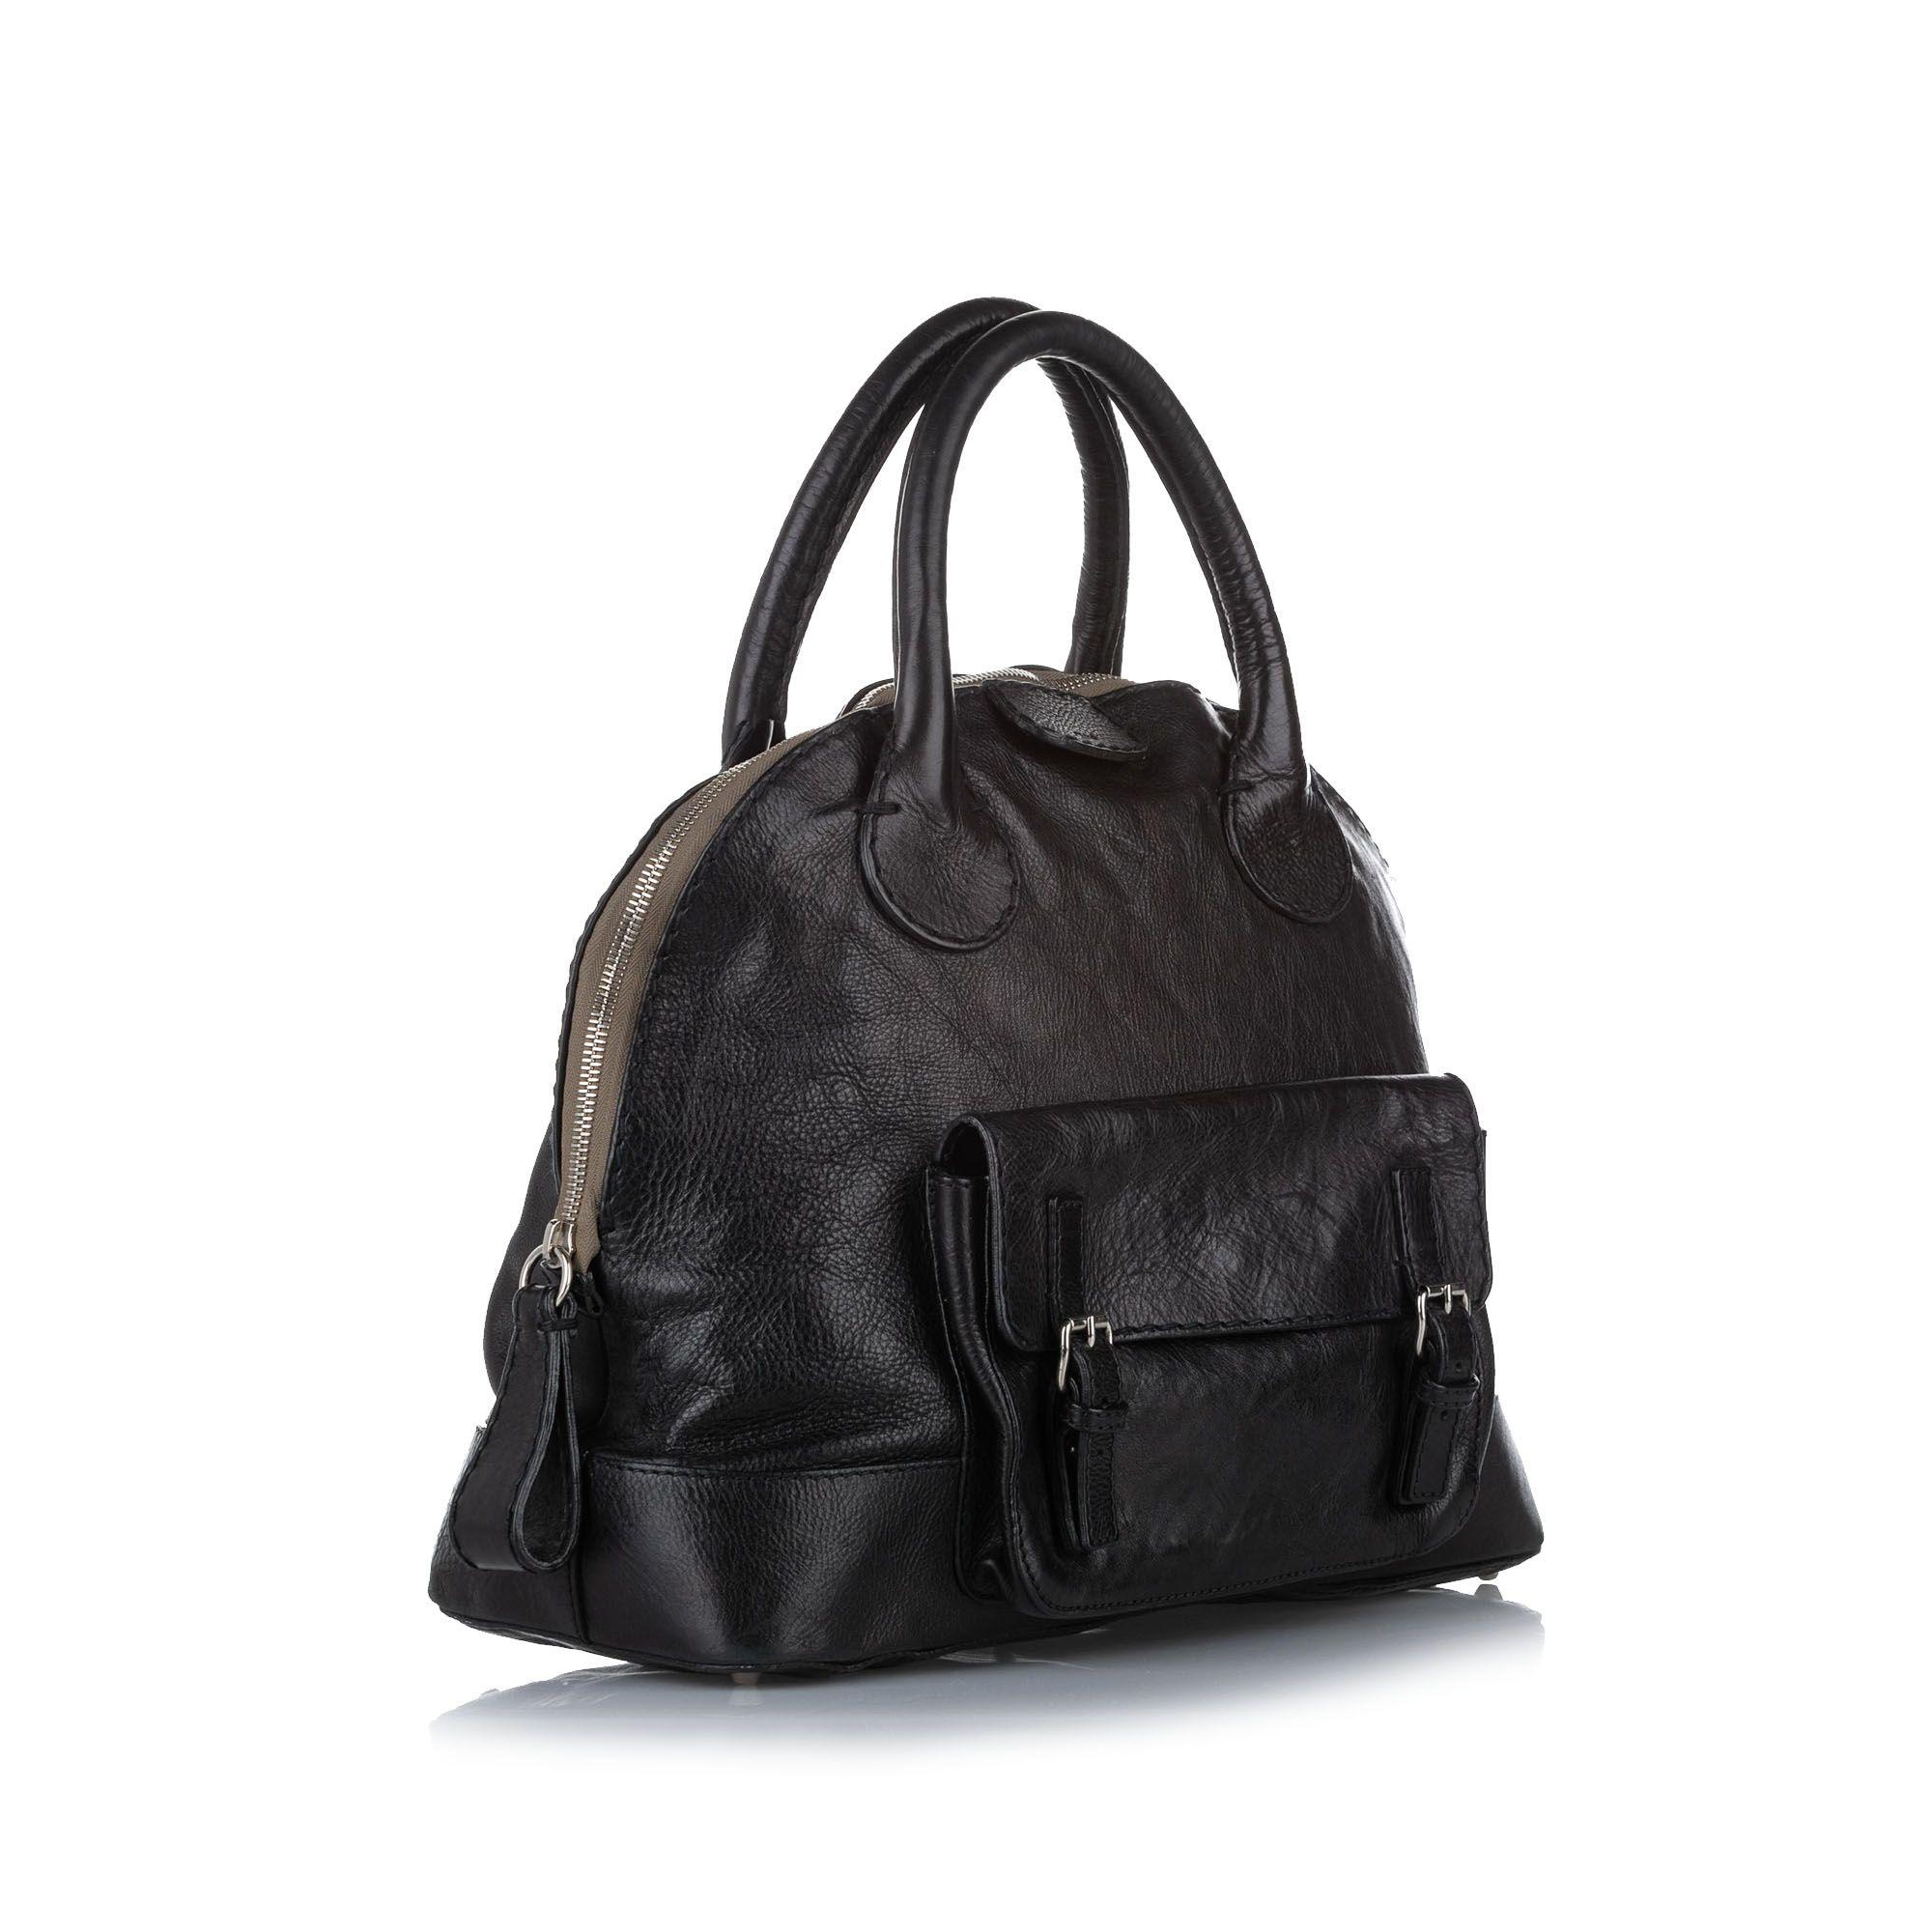 Vintage Chloe Edith Dome Bowler Bag Black